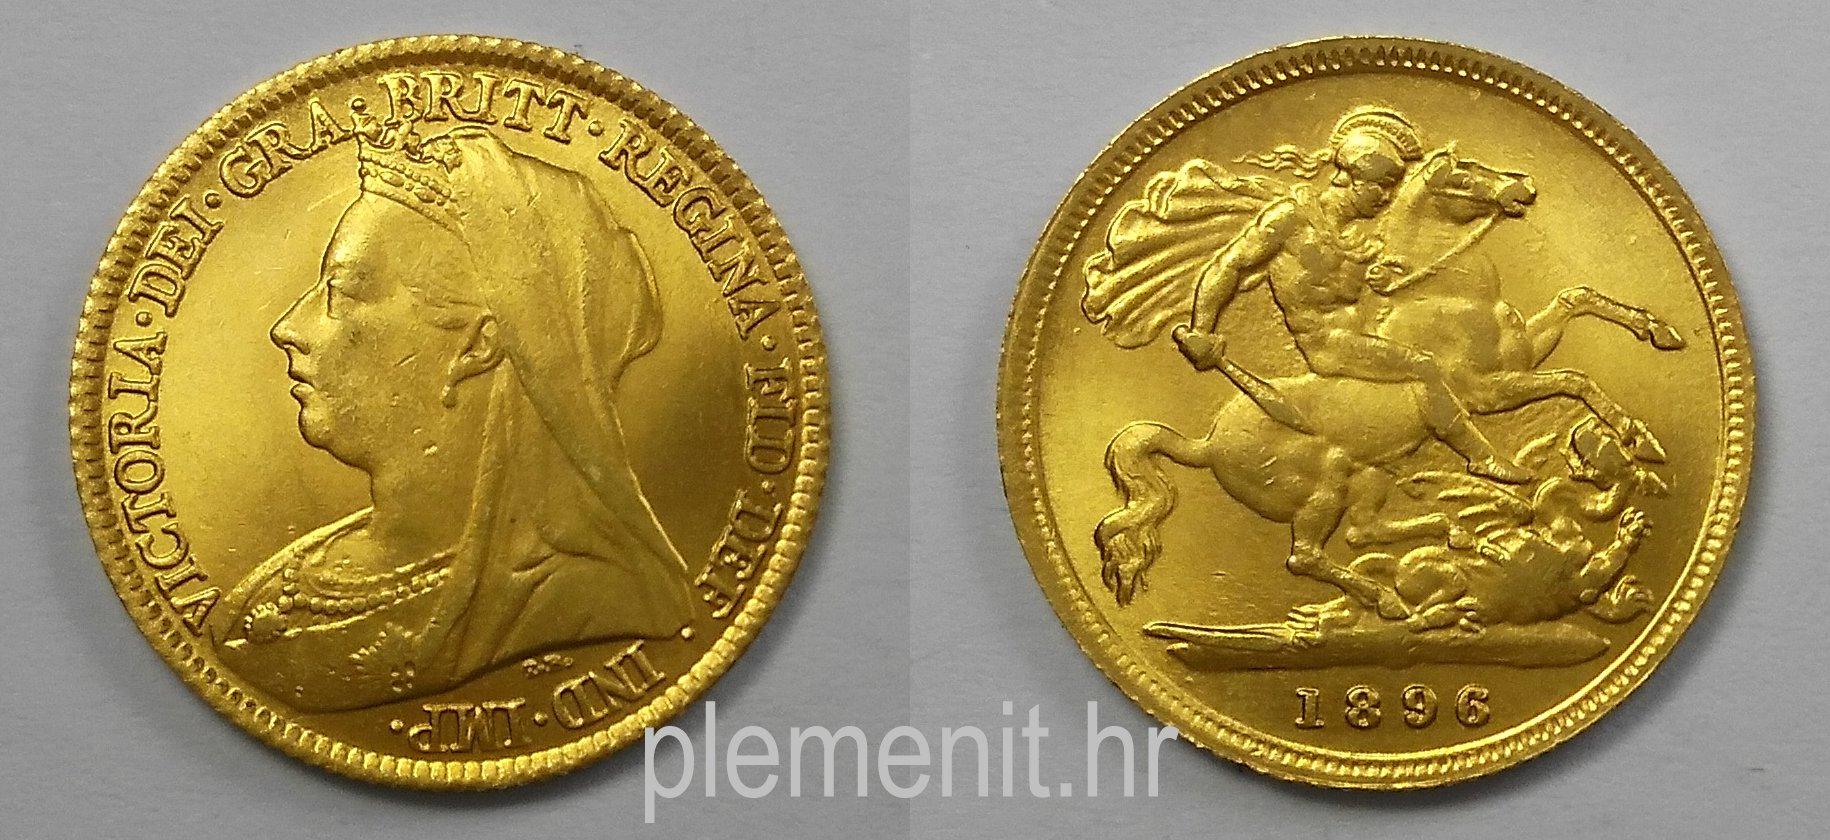 Half Sovereign Kraljica Victoria s velom 1896